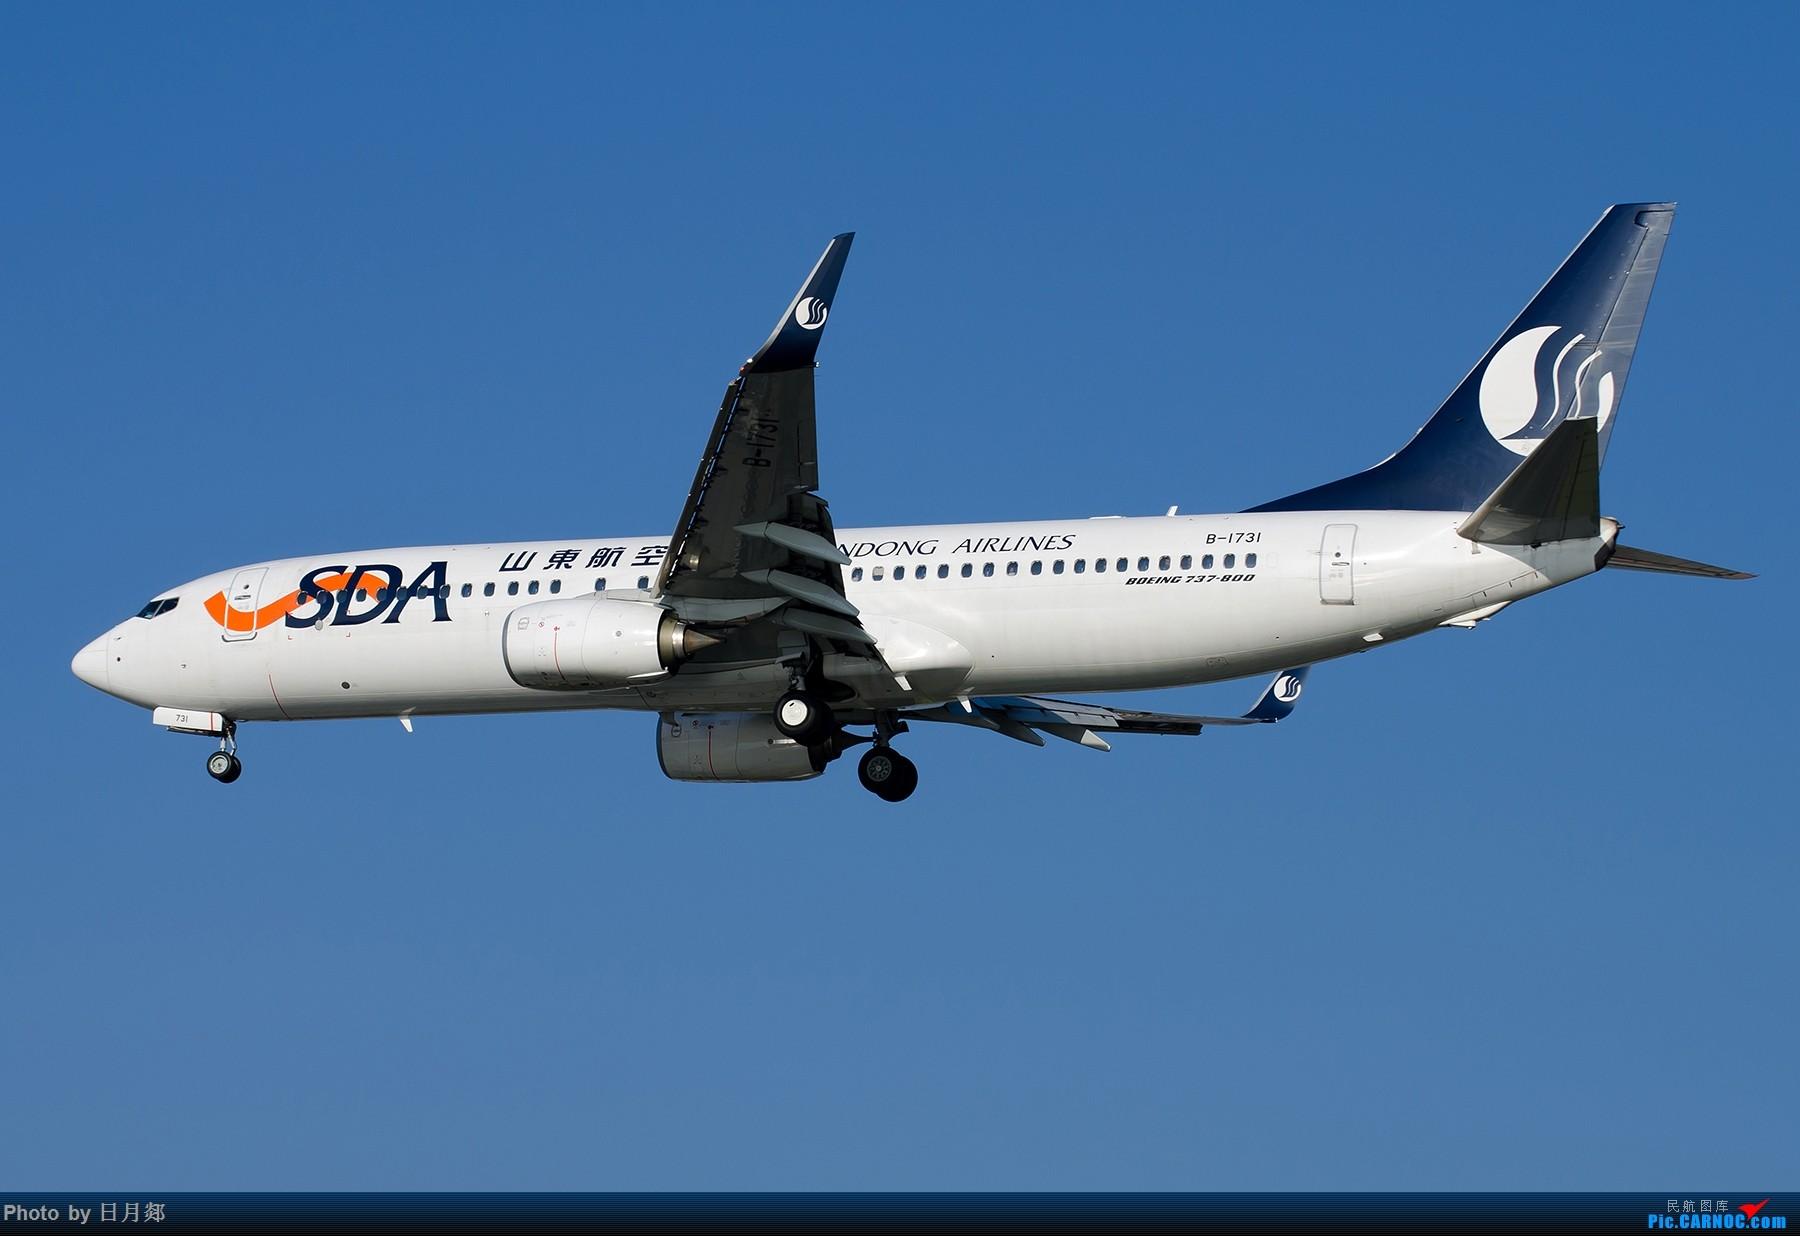 Re:[原创]【SHA拍机*1800大图】轻度污染来临前宝贵的蓝天,且拍且珍惜 BOEING 737-800 B-1731 中国上海虹桥国际机场